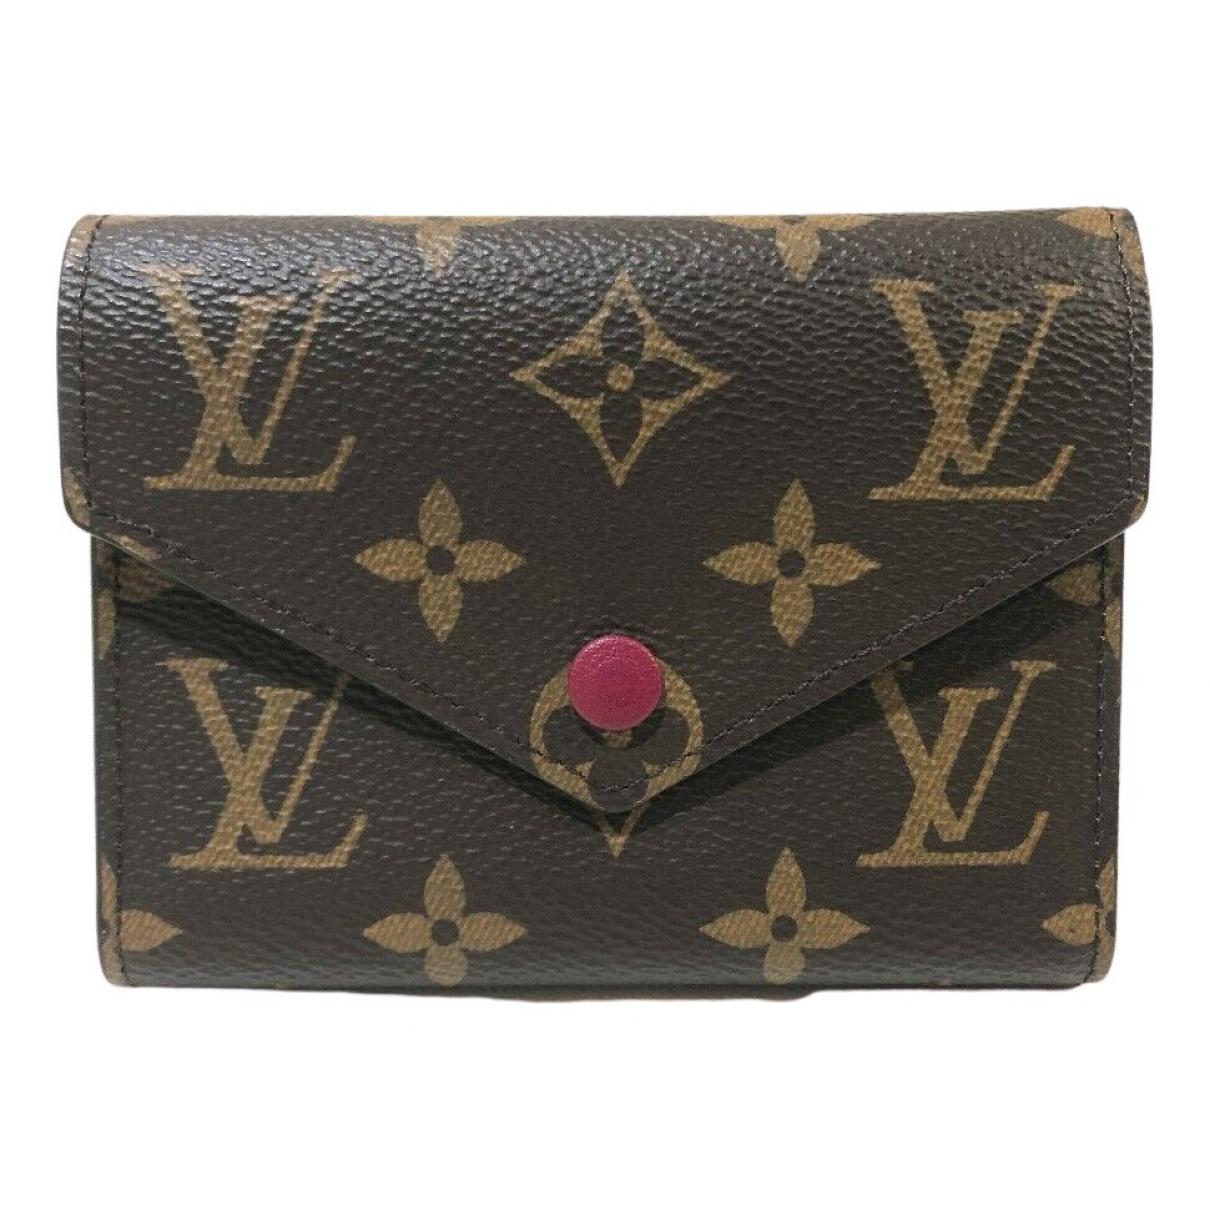 Cartera Victorine de Lona Louis Vuitton